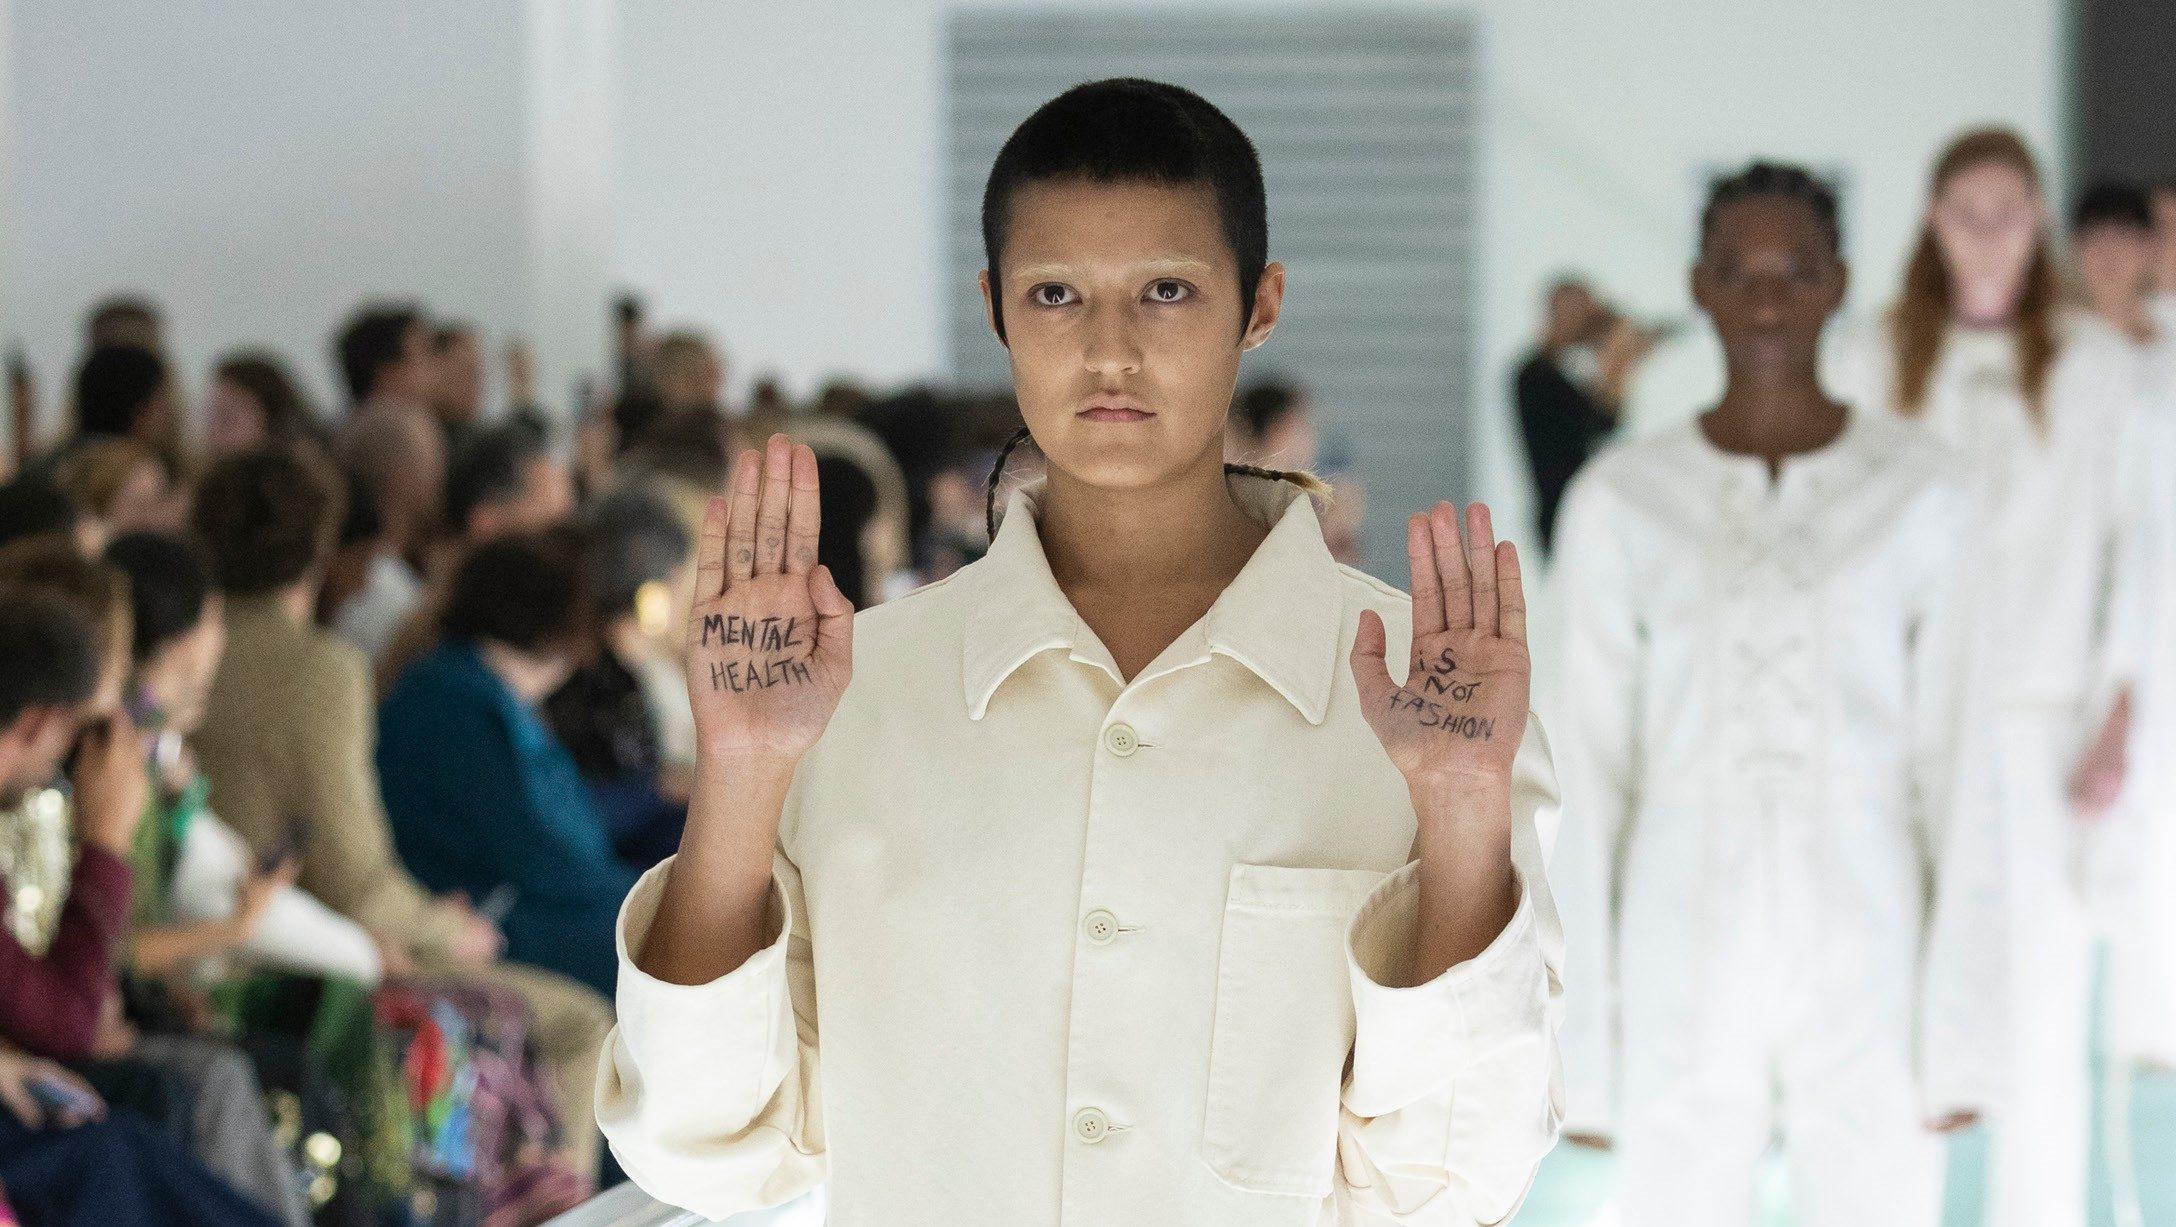 Gucci model protests its use of straitjackets at Milan Fashion Week